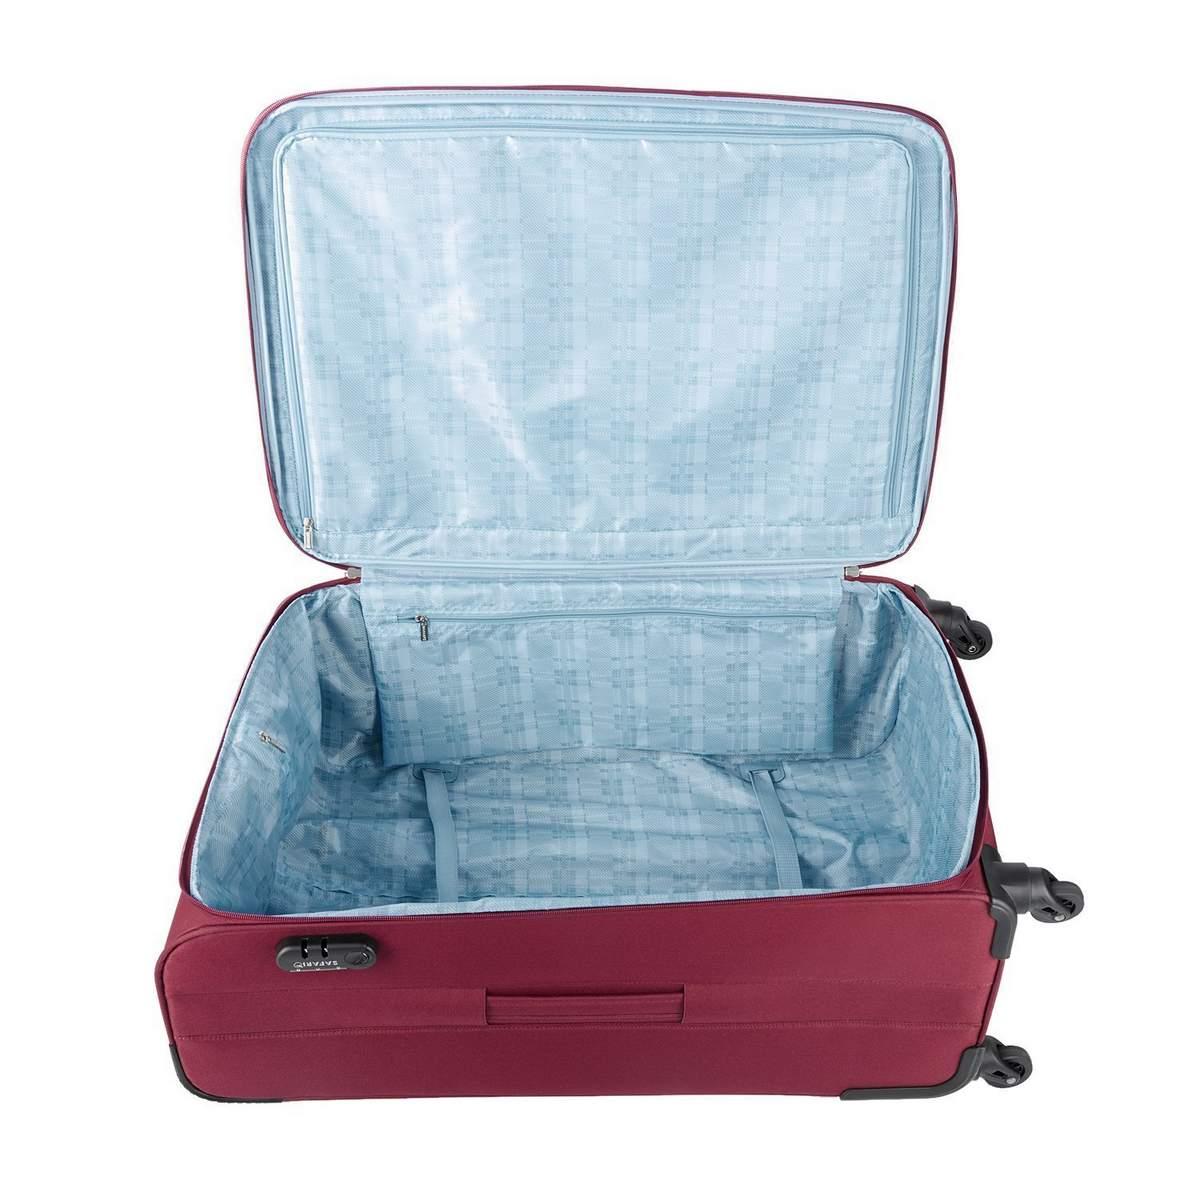 Safari Javelin 4 Wheel 75 Cm Check In Luggage Bag Sunrise